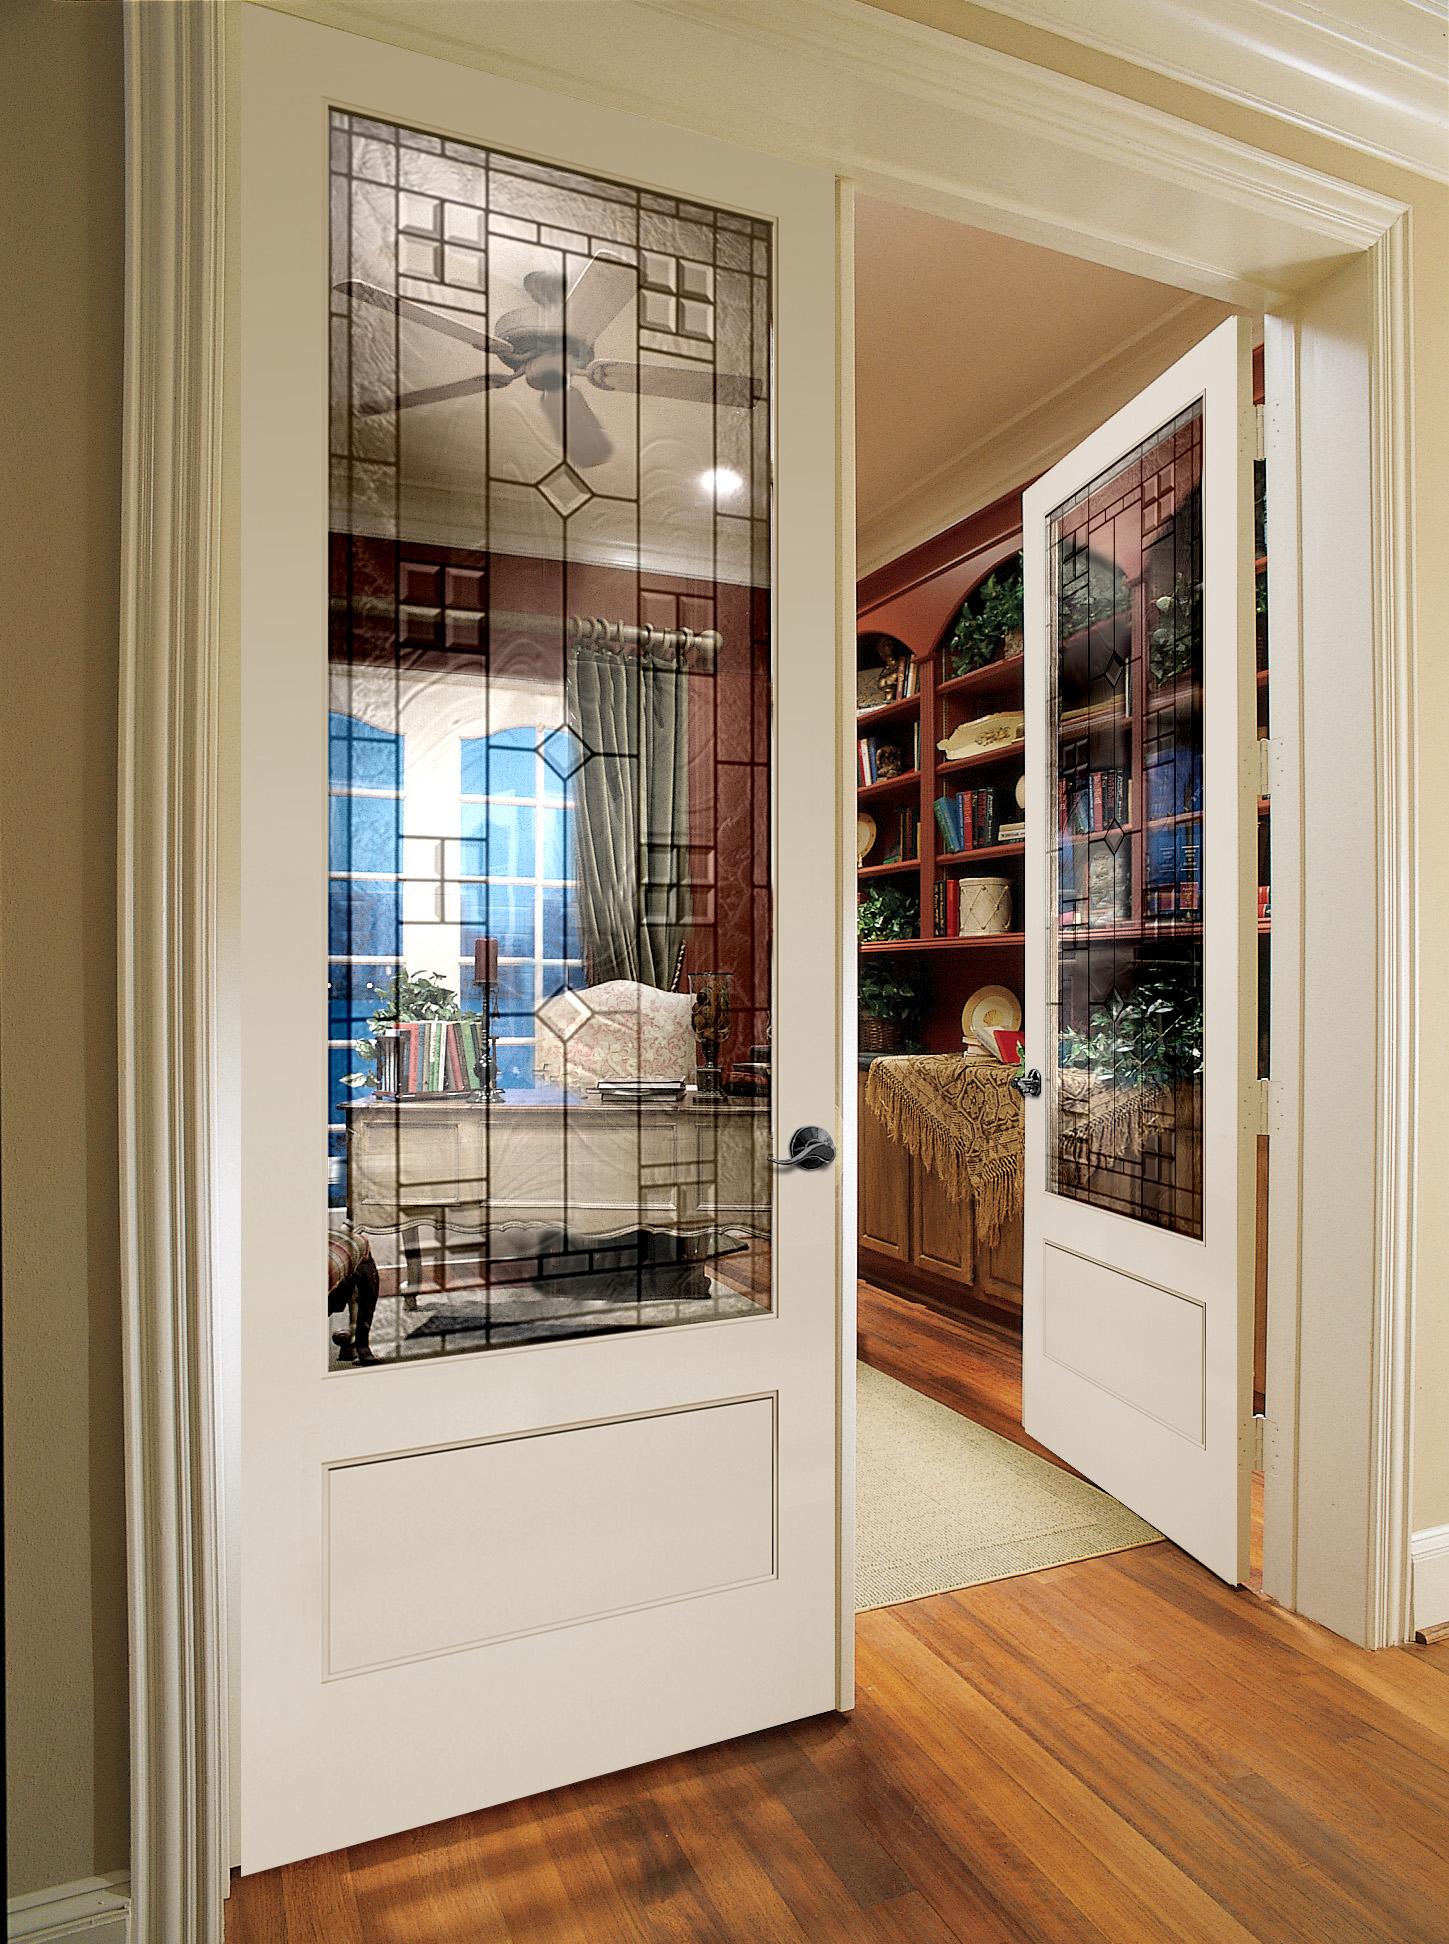 20 adventiges of French doors interior design